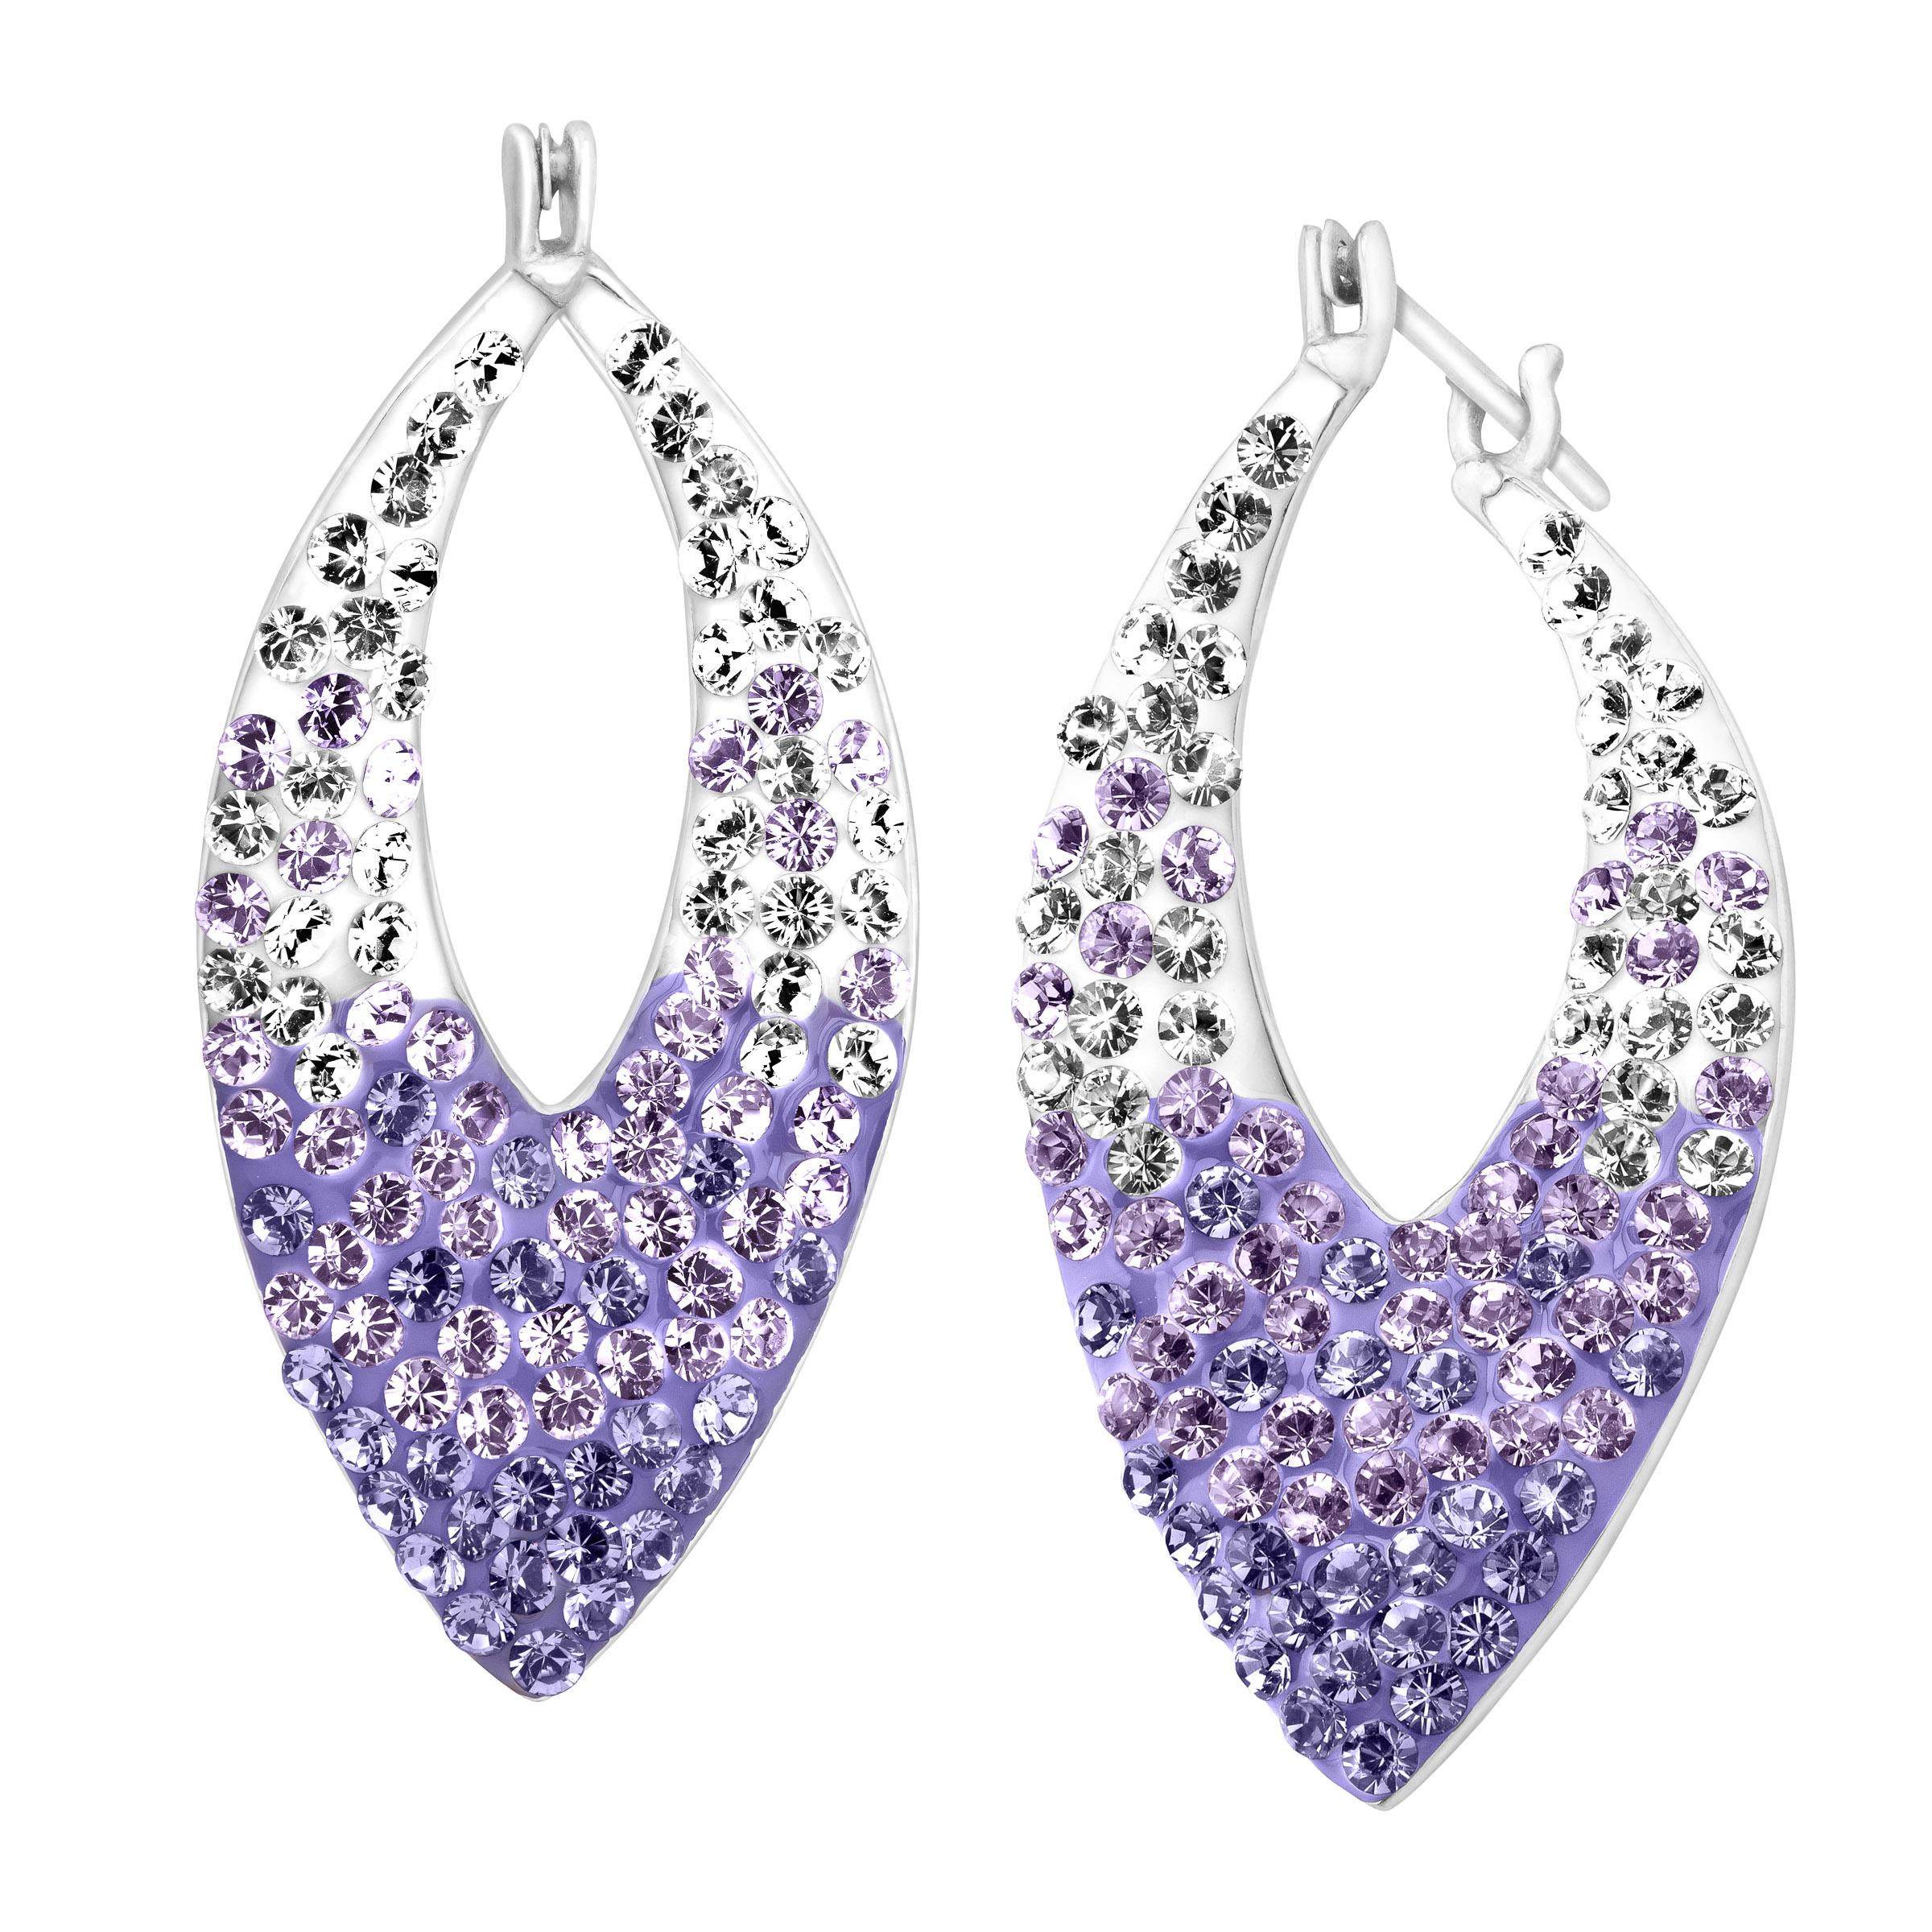 Crystaluxe Pointed Hoop Earrings with Lavender Swarovski Crystals in Sterling Silver